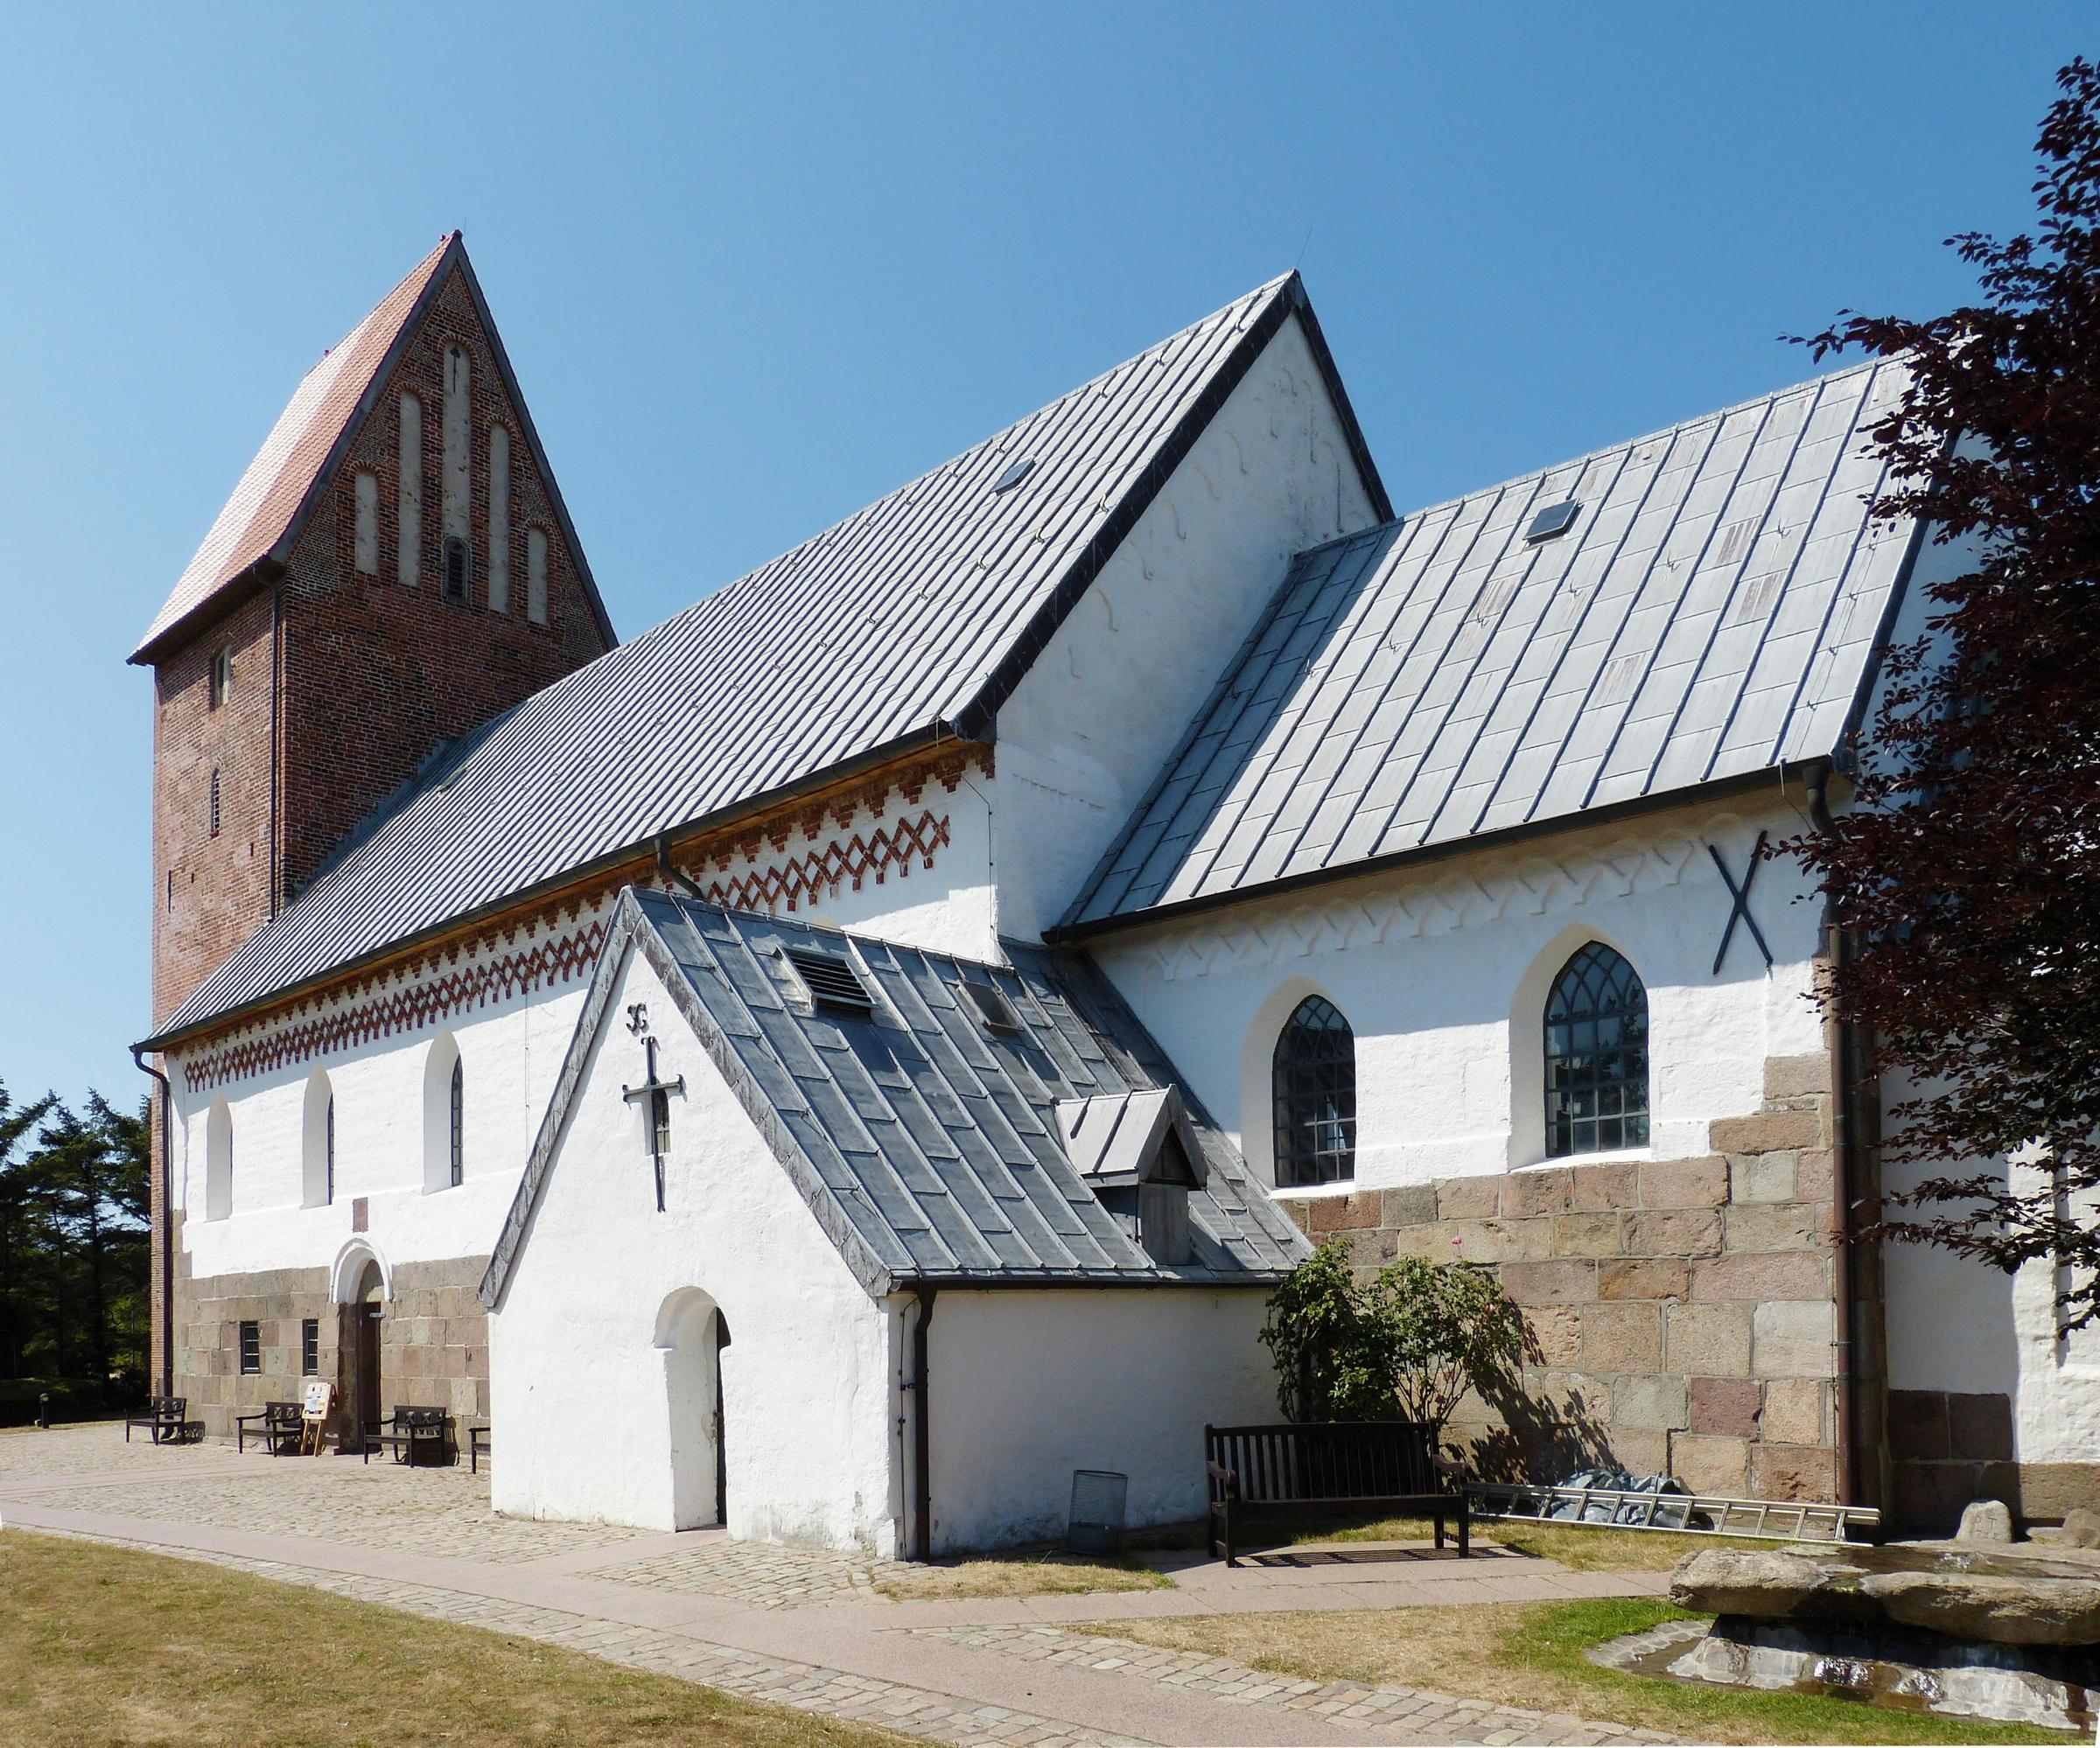 Im Urlaub angekommen: Keitumer Kirche // Foto © Frank Nürnberger (Pixabay)